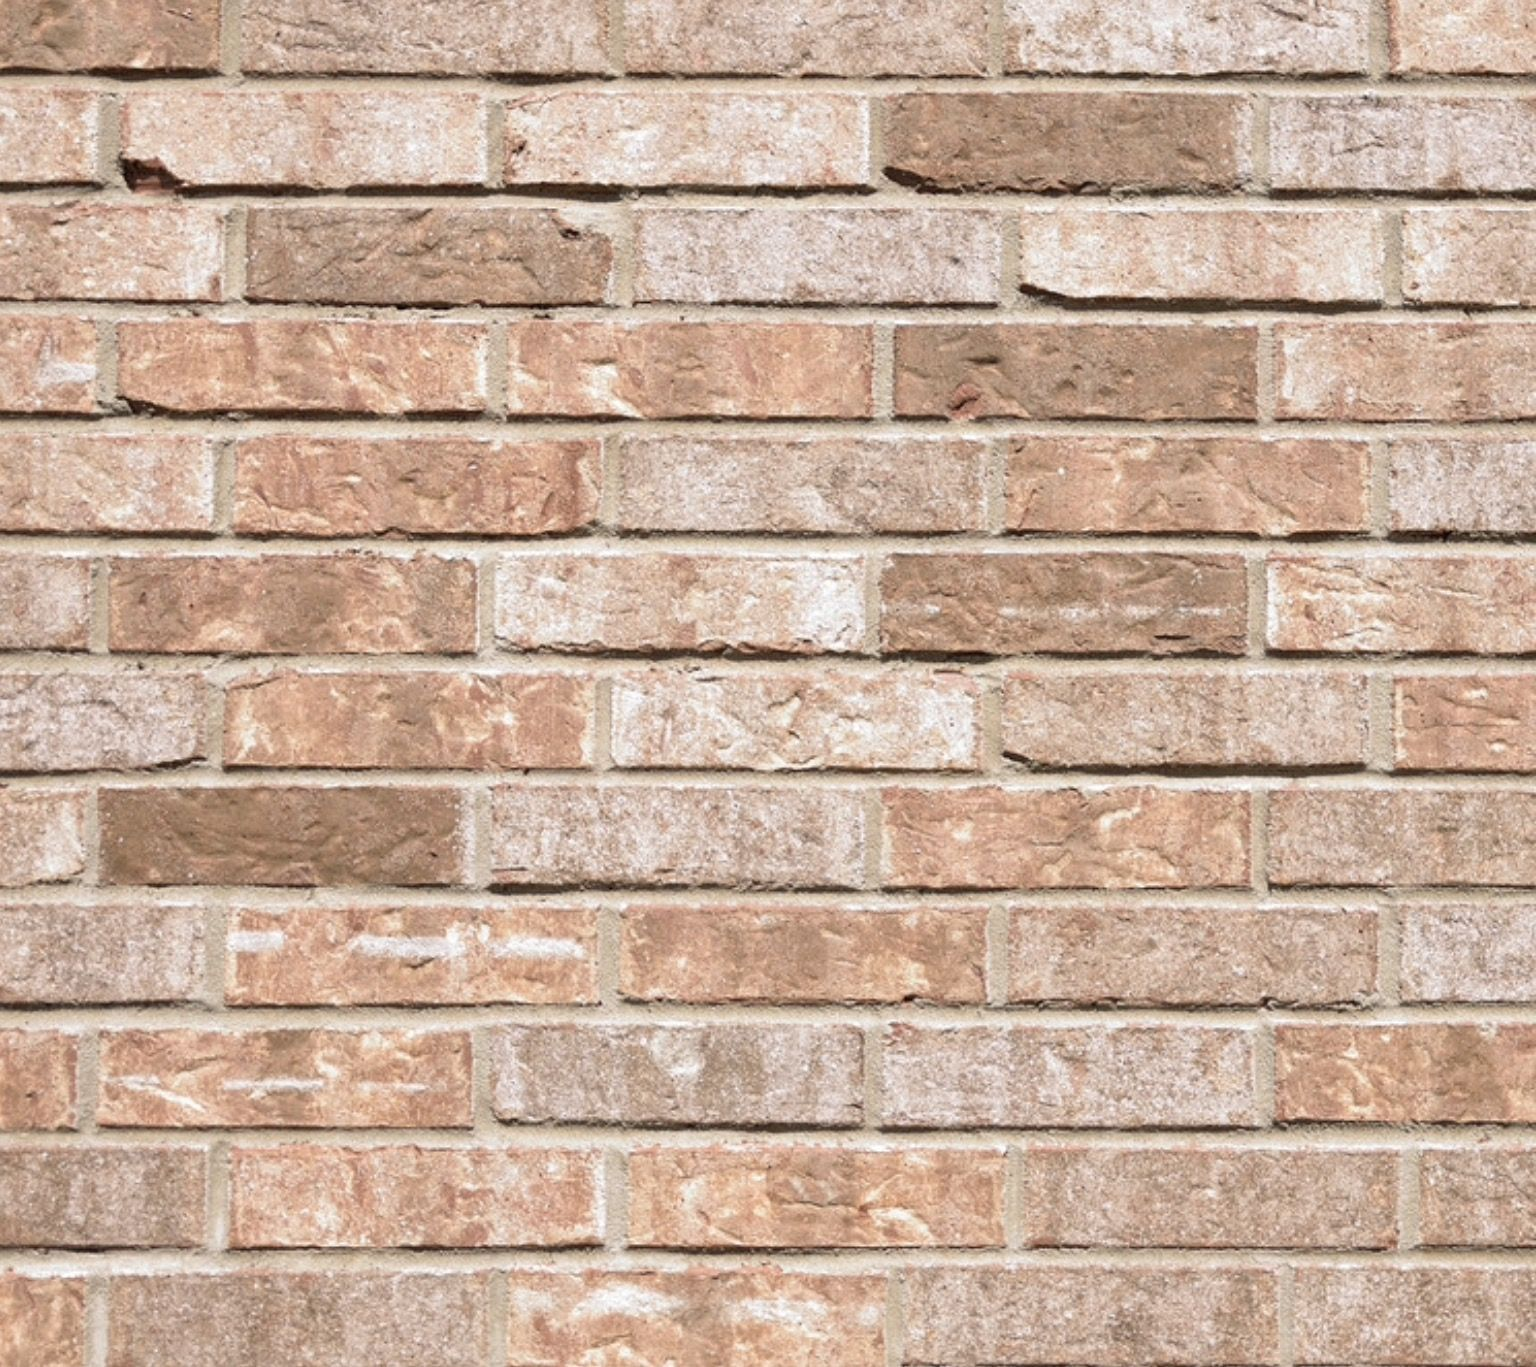 Oak Reserve Brick Stone Siding Exterior Brick Brick